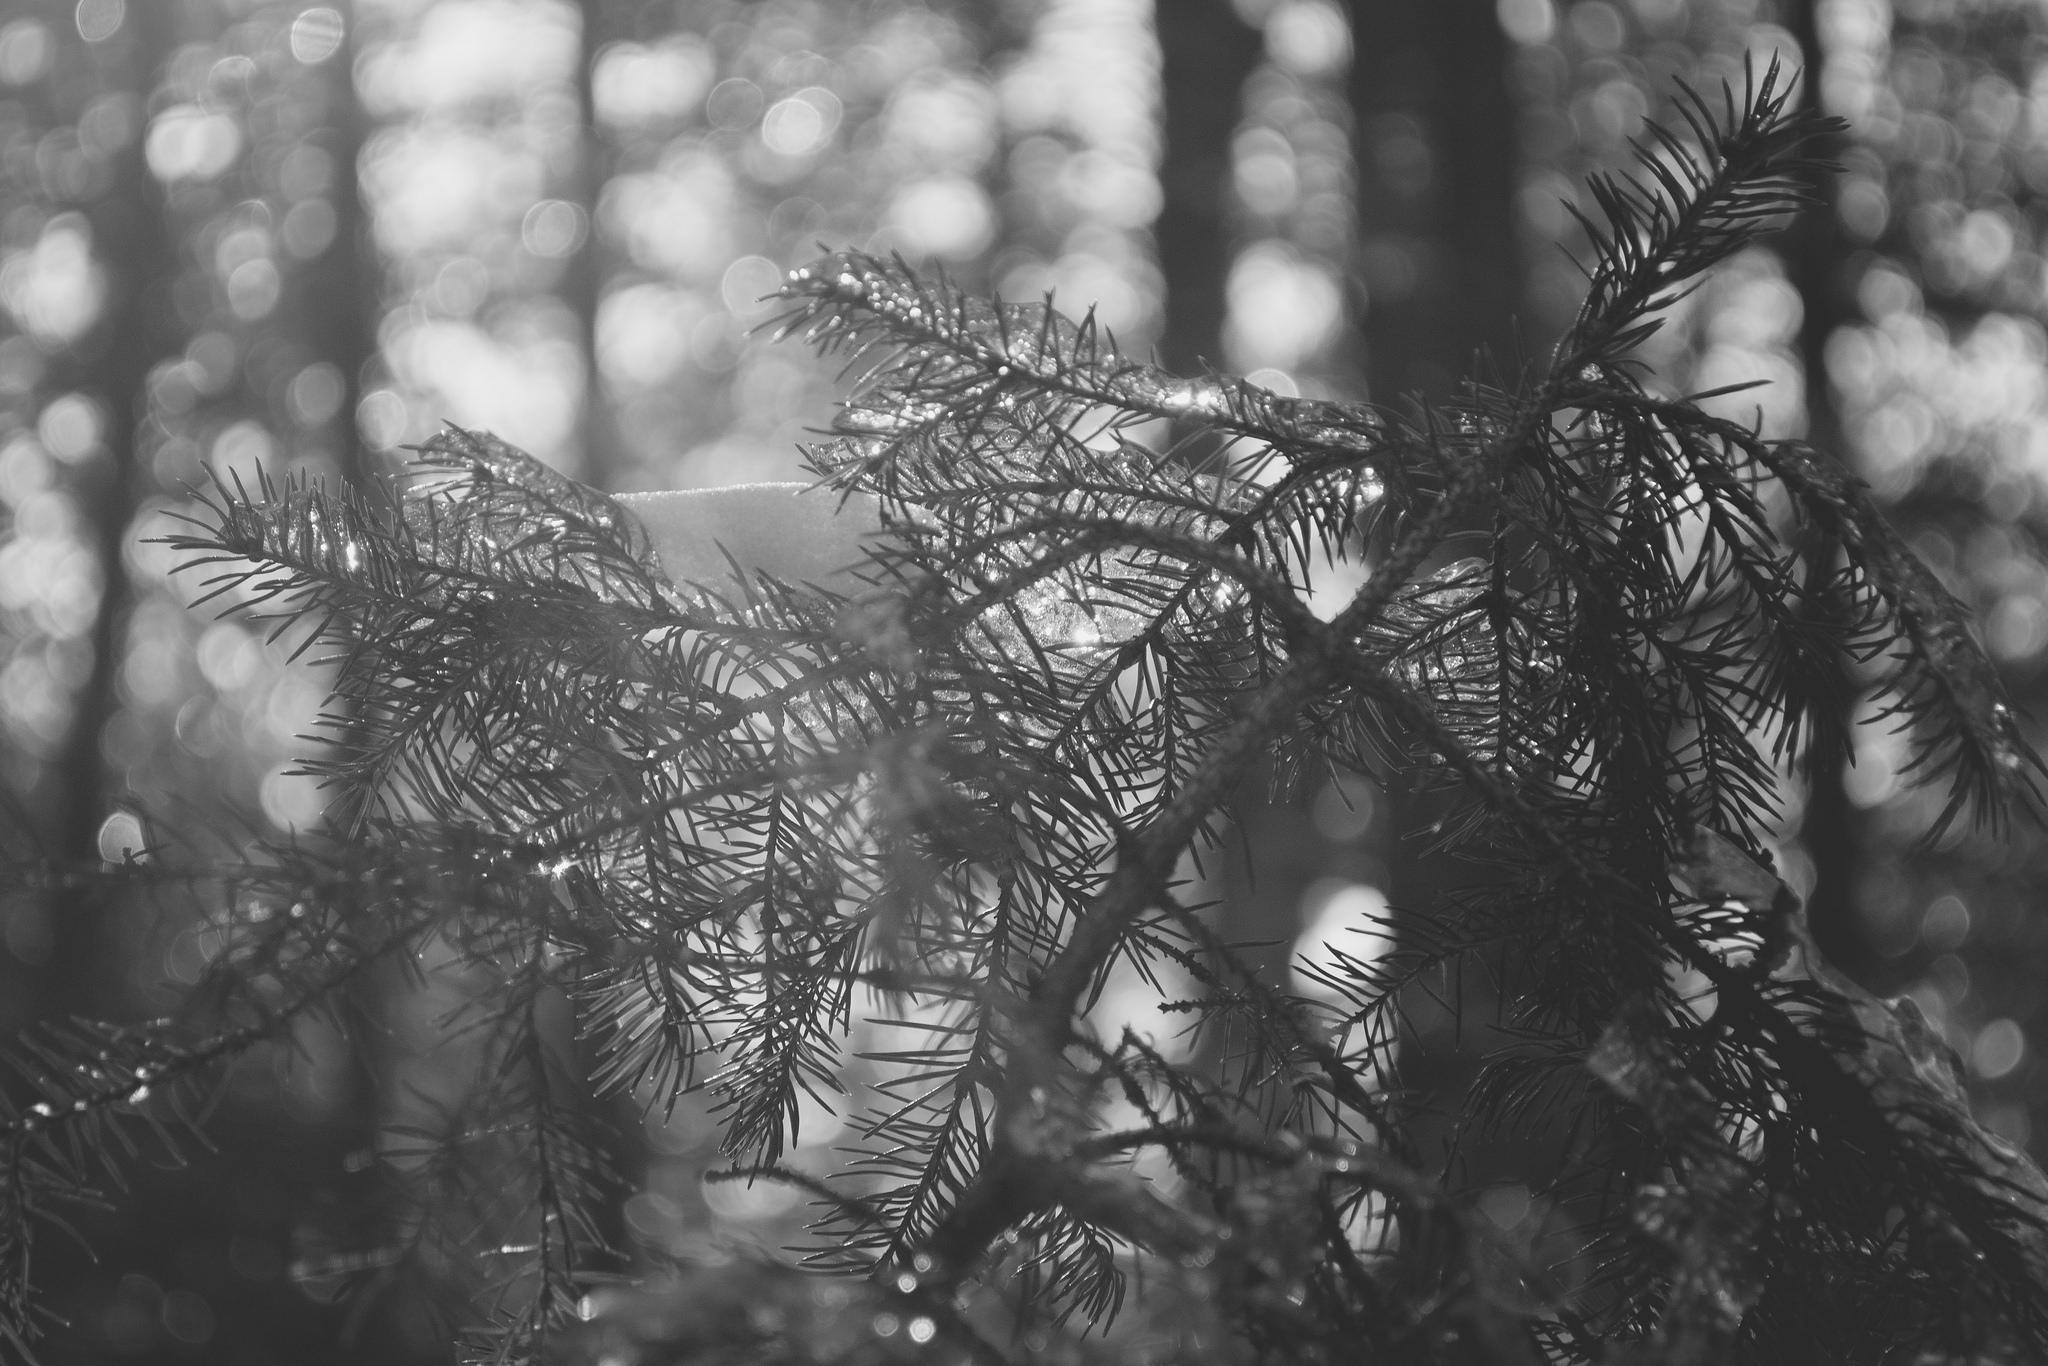 Branch in Sunlight (1/125s, f/5.6, ISO400)